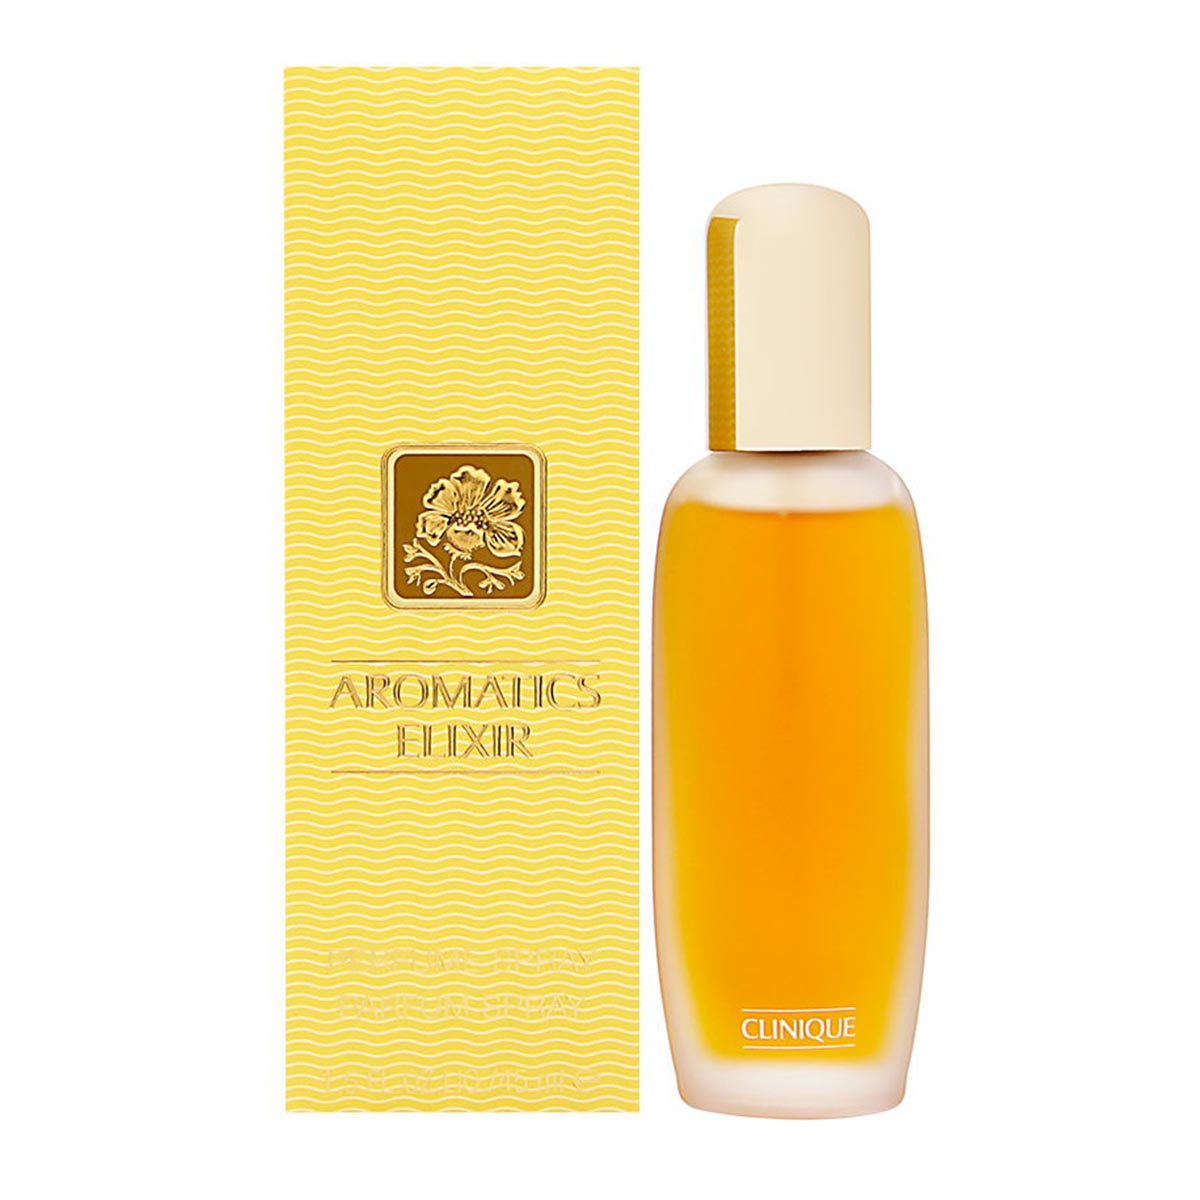 Clinique aromatics elixir eau de parfum 25ml vaporizador